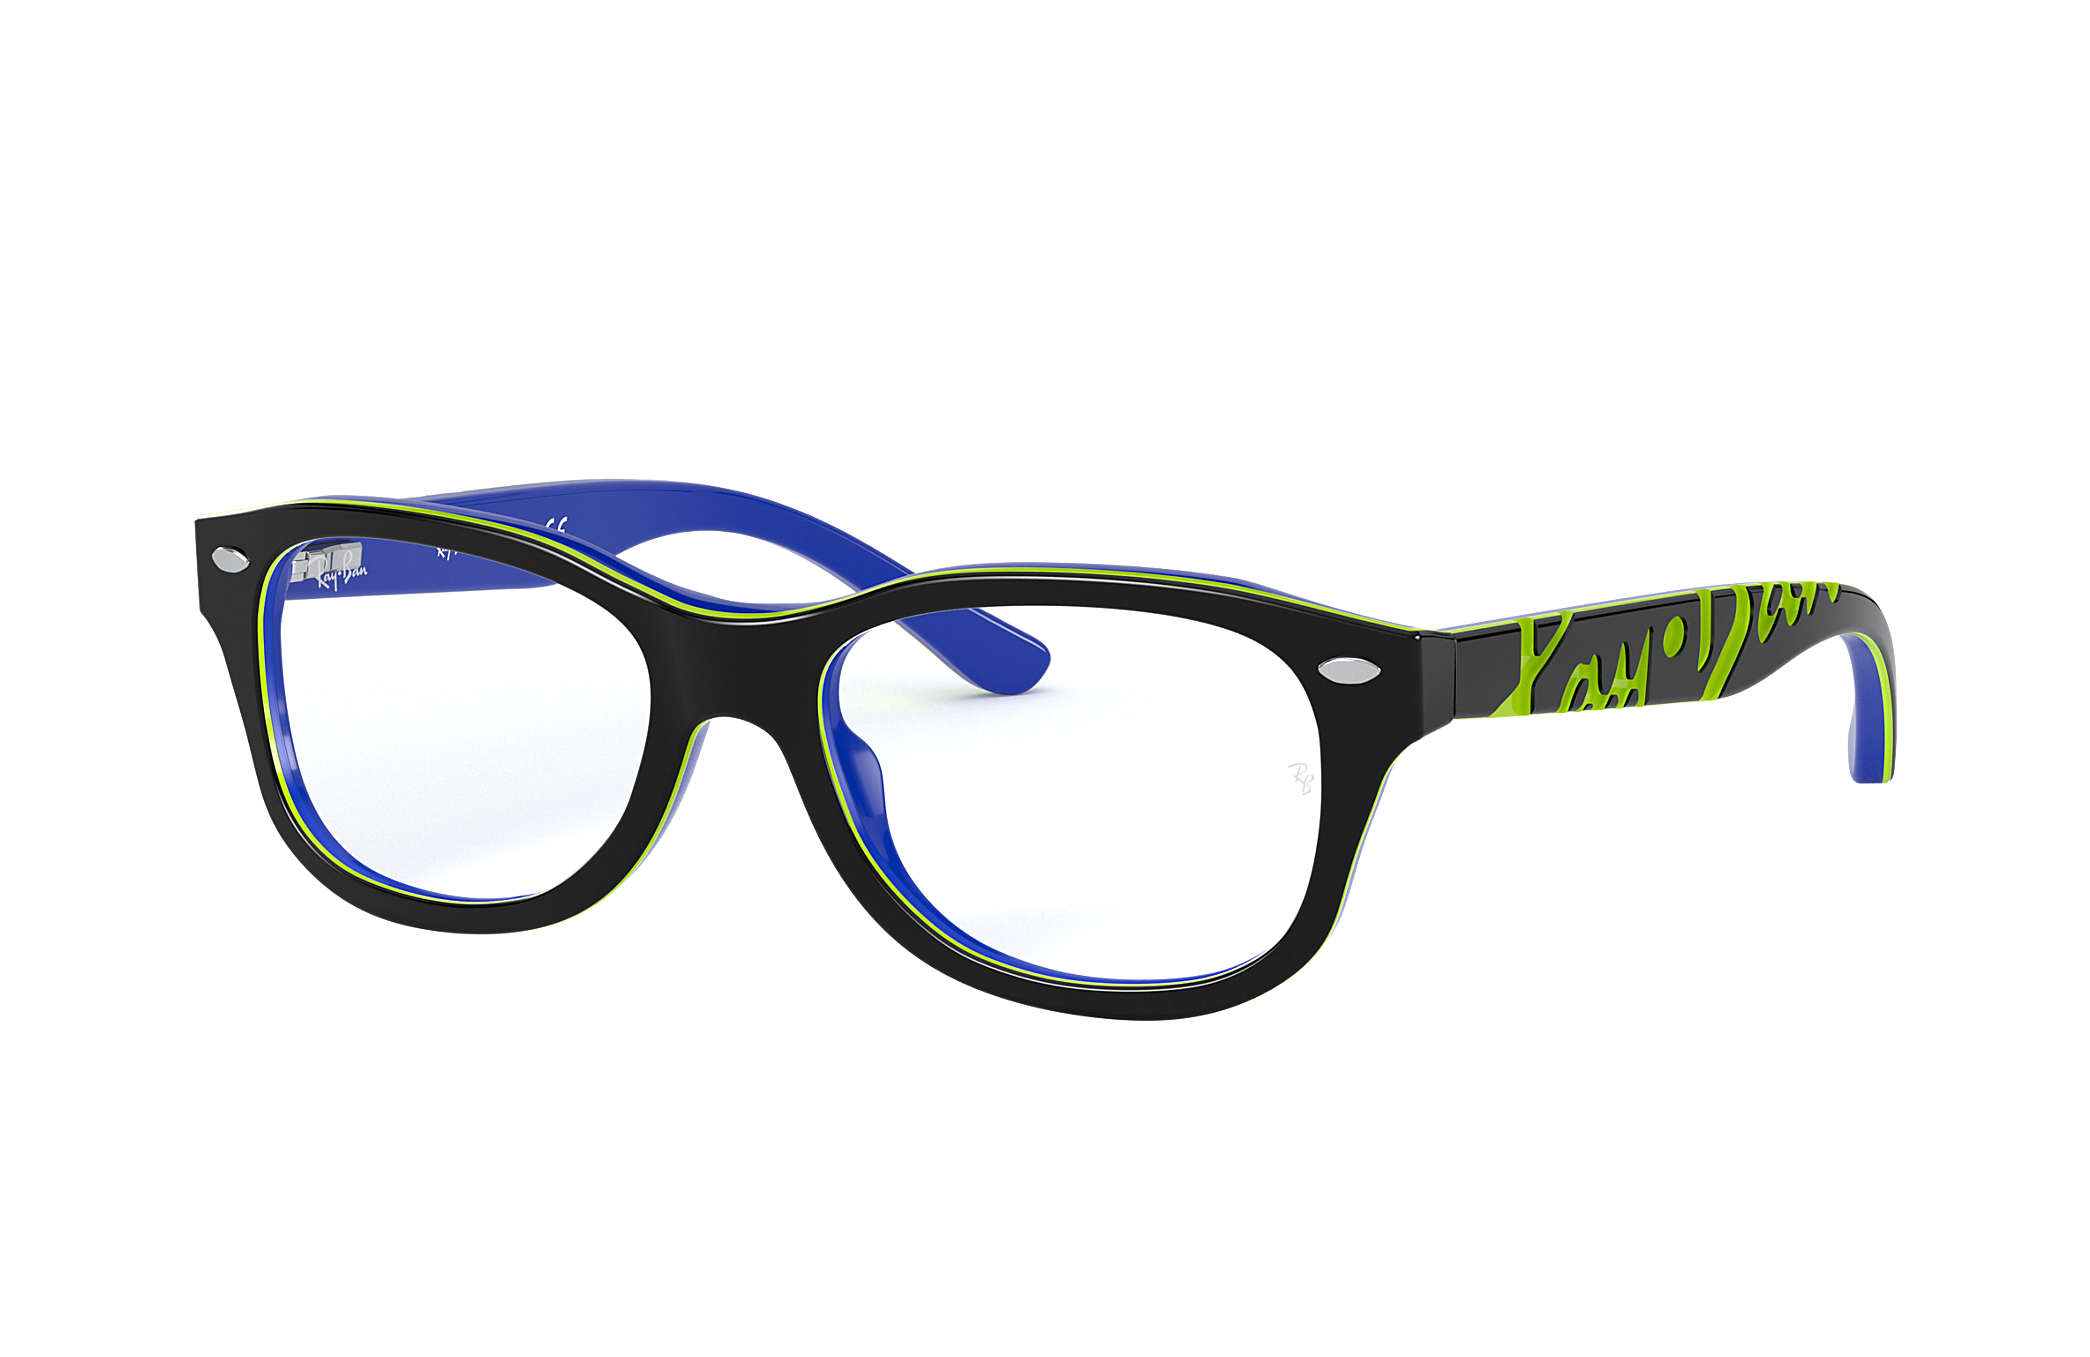 c2ab98e53c Ray-Ban prescription glasses RY1544 Grey - Acetate - 0RY1544360048 ...